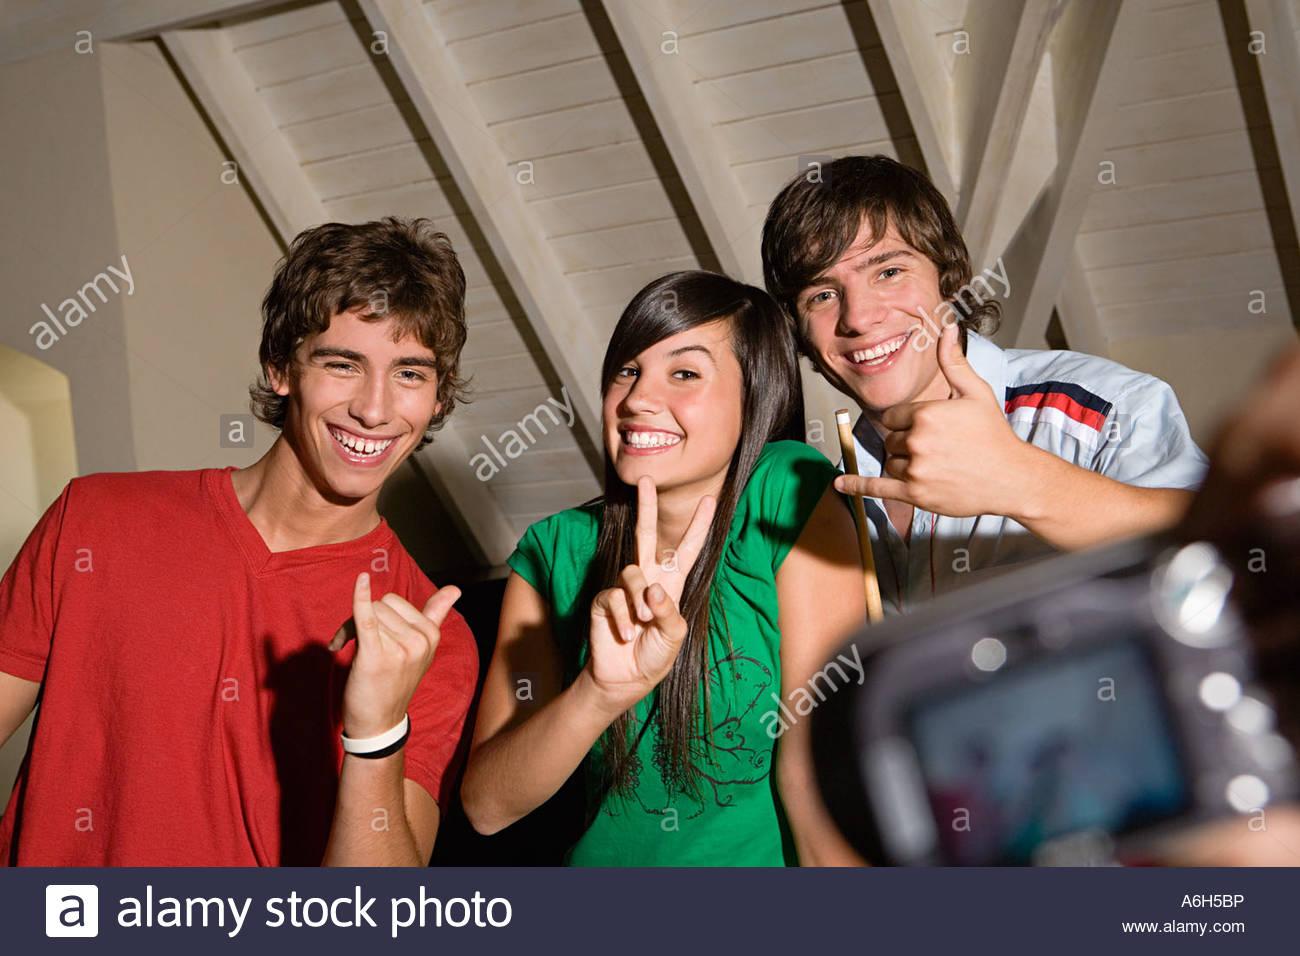 Teenagers having photograph taken - Stock Image